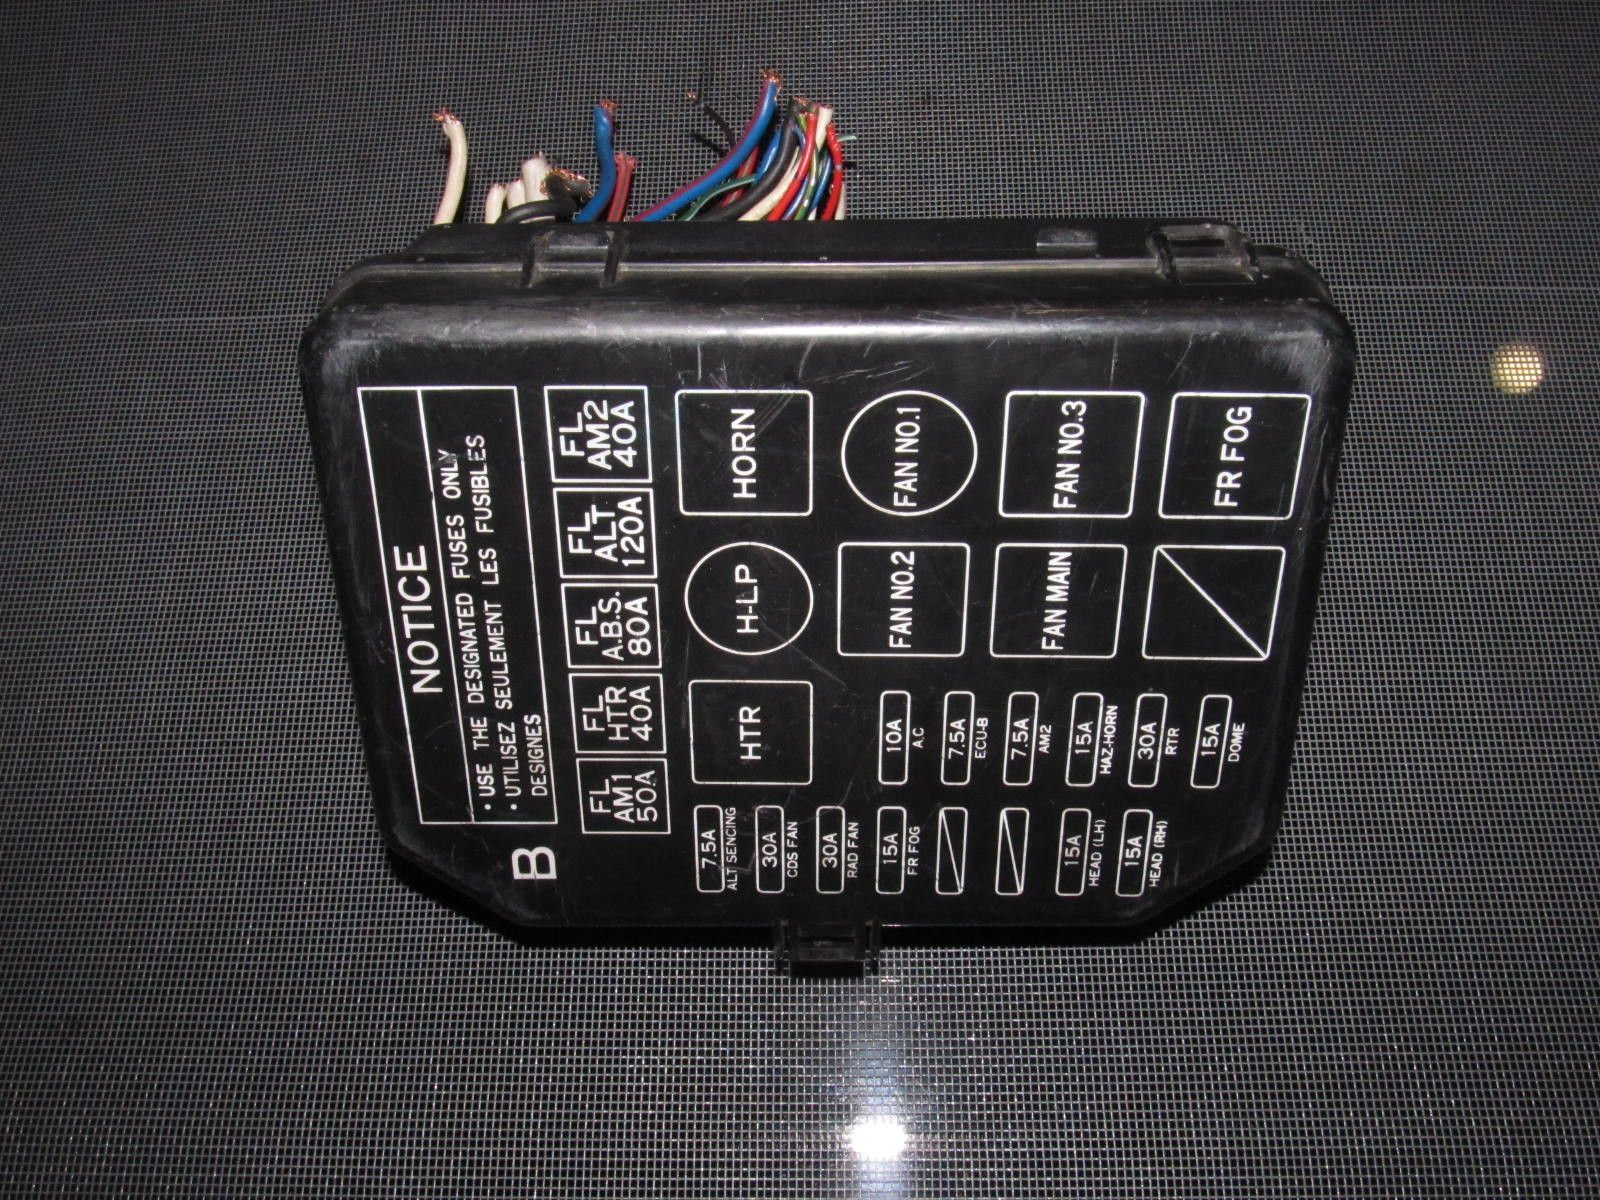 hight resolution of 91 95 toyota mr2 oem interior fuse box autopartone com products 2000 f150 fuse box diagram